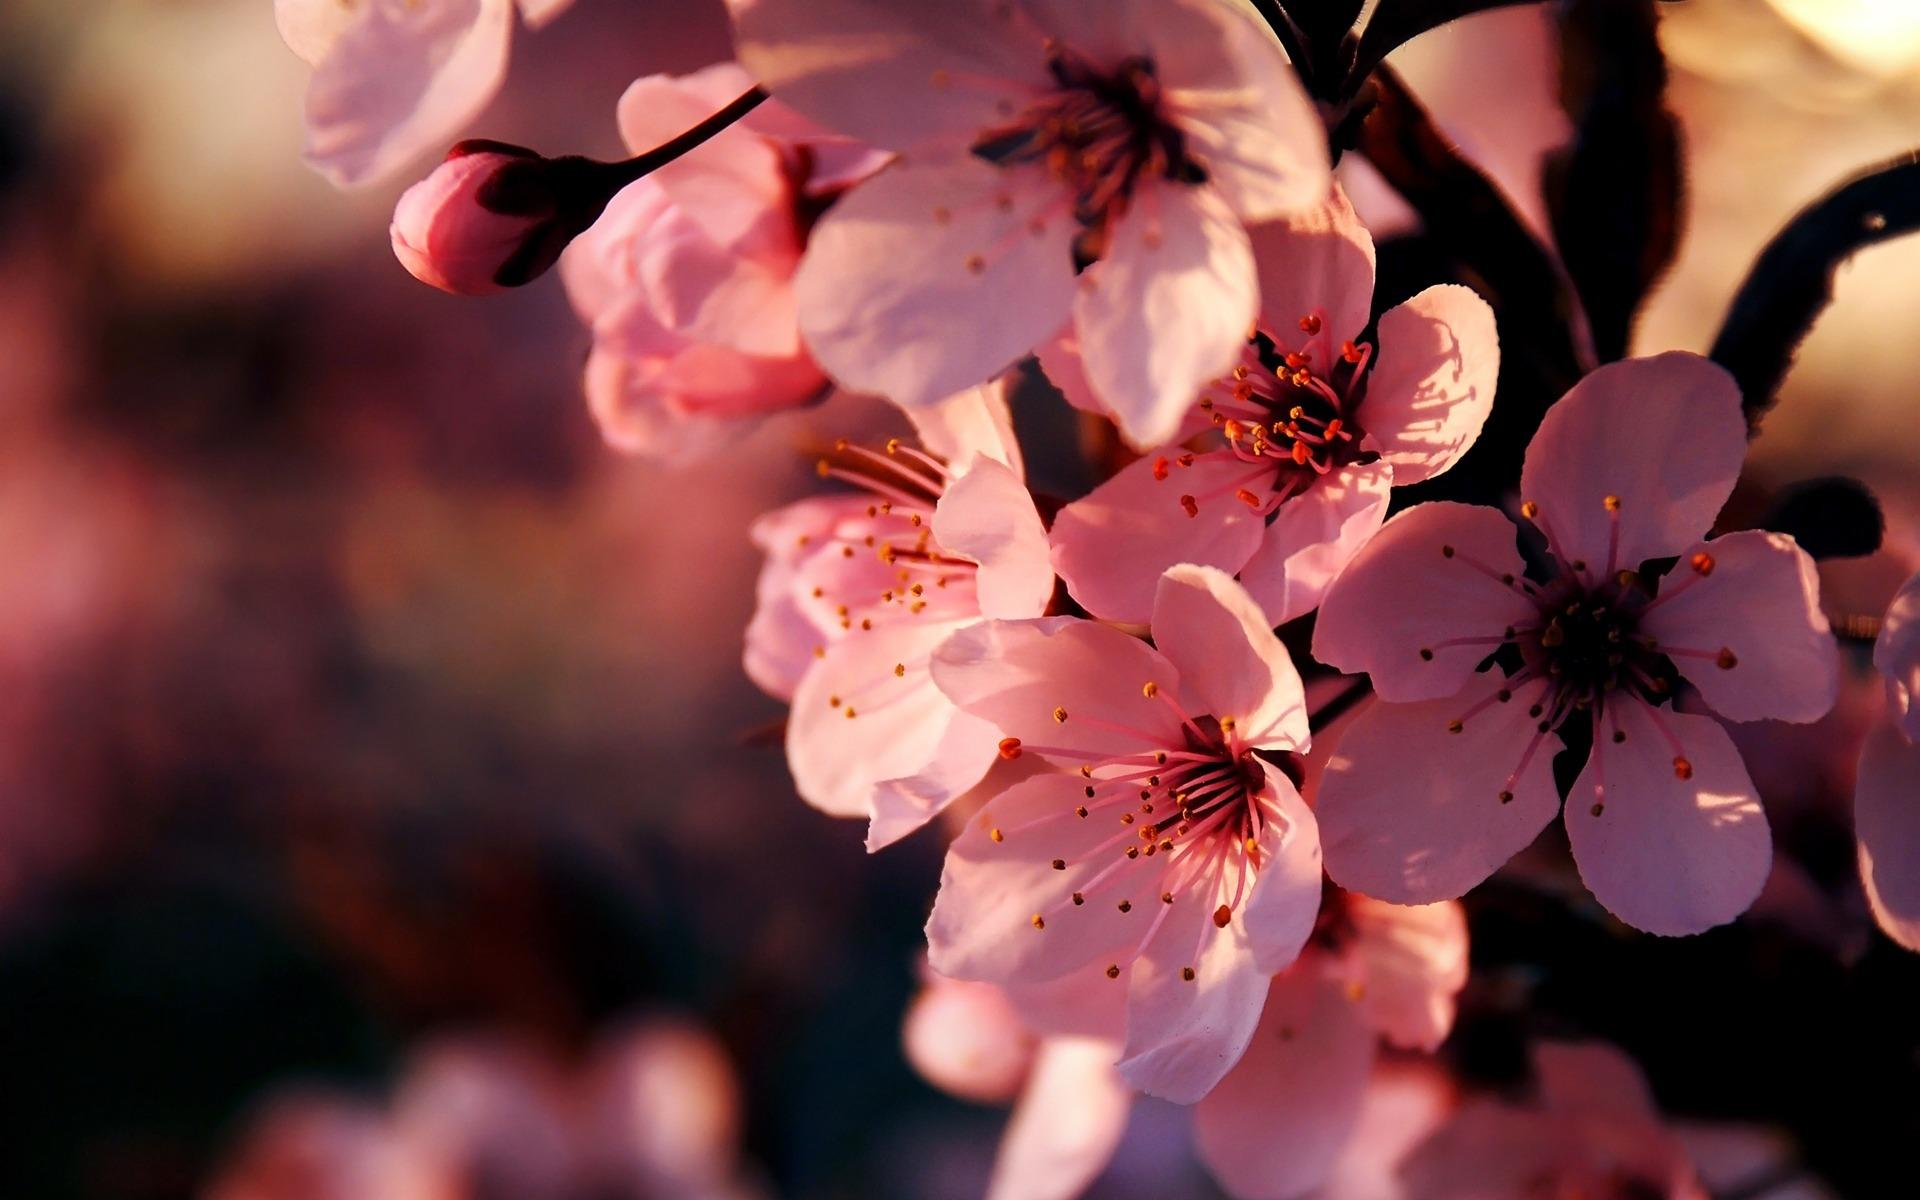 Картинки с цветами сакуры